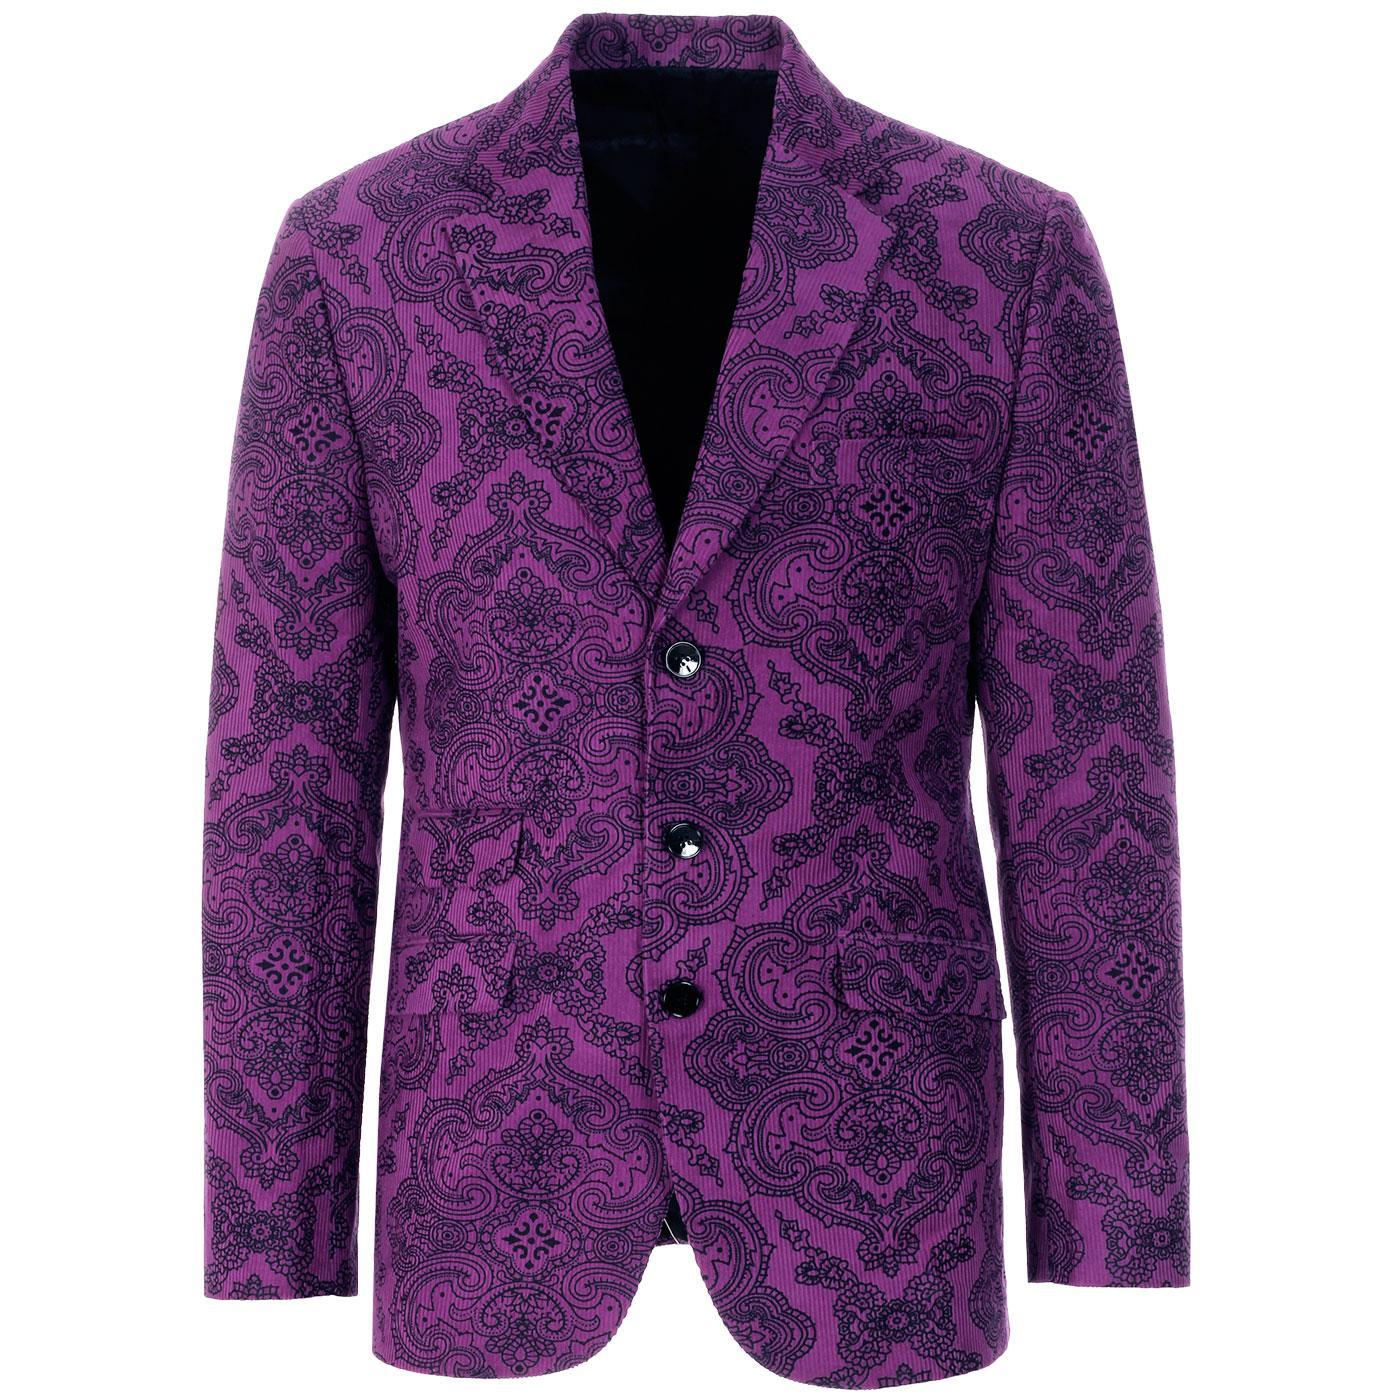 Madcap England Men's 1960s Psychedelic Paisley Cord Blazer Jacket in Grape